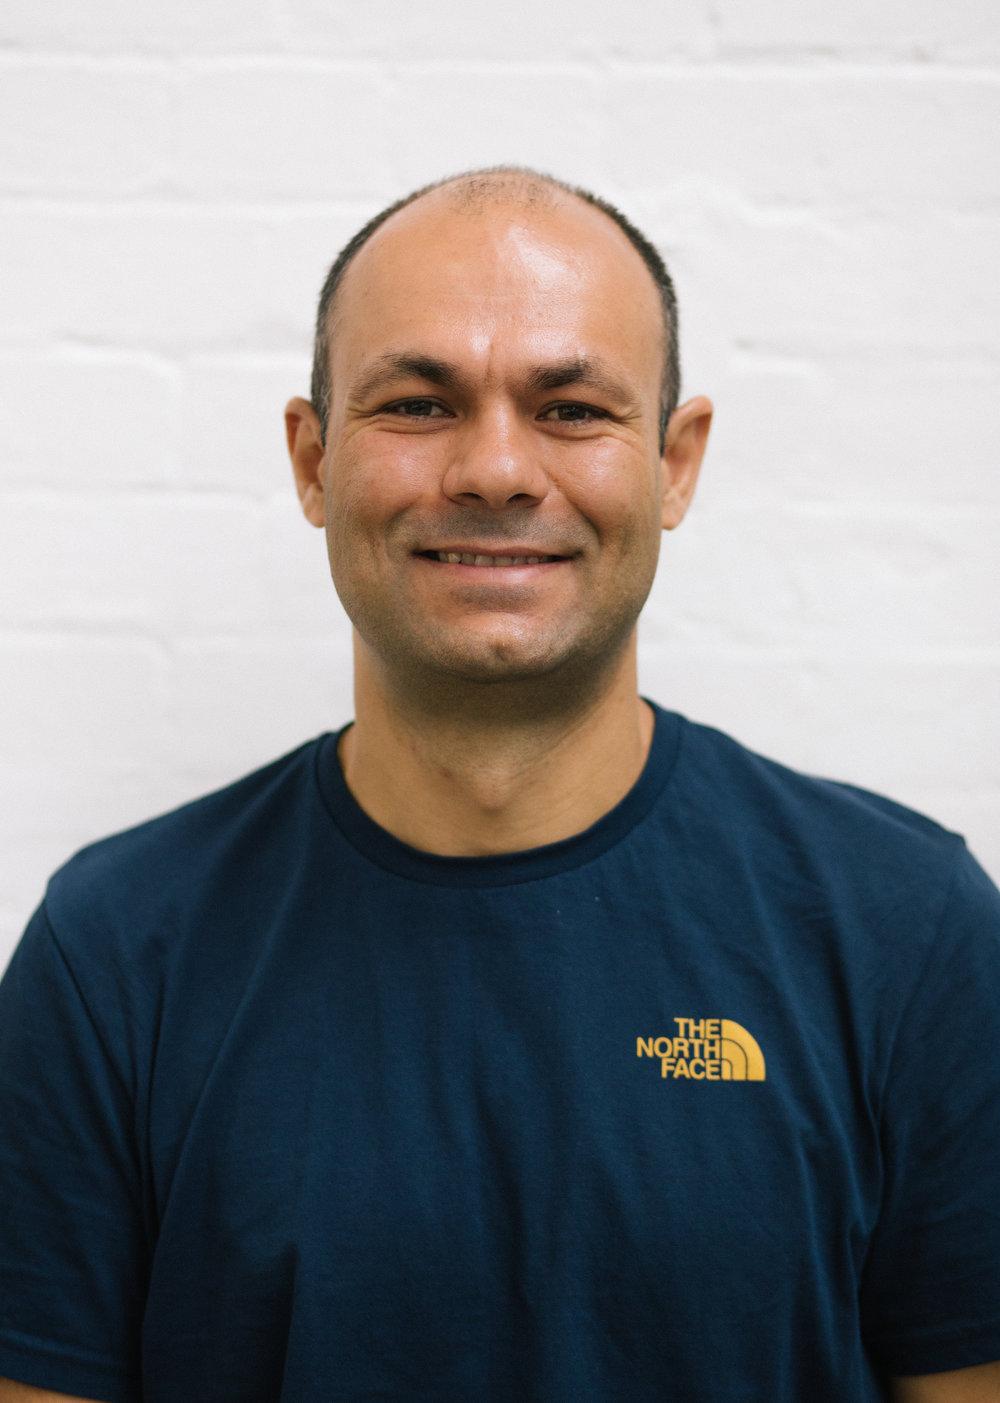 Amir Saffari, VP AI Research at BenevolentAI